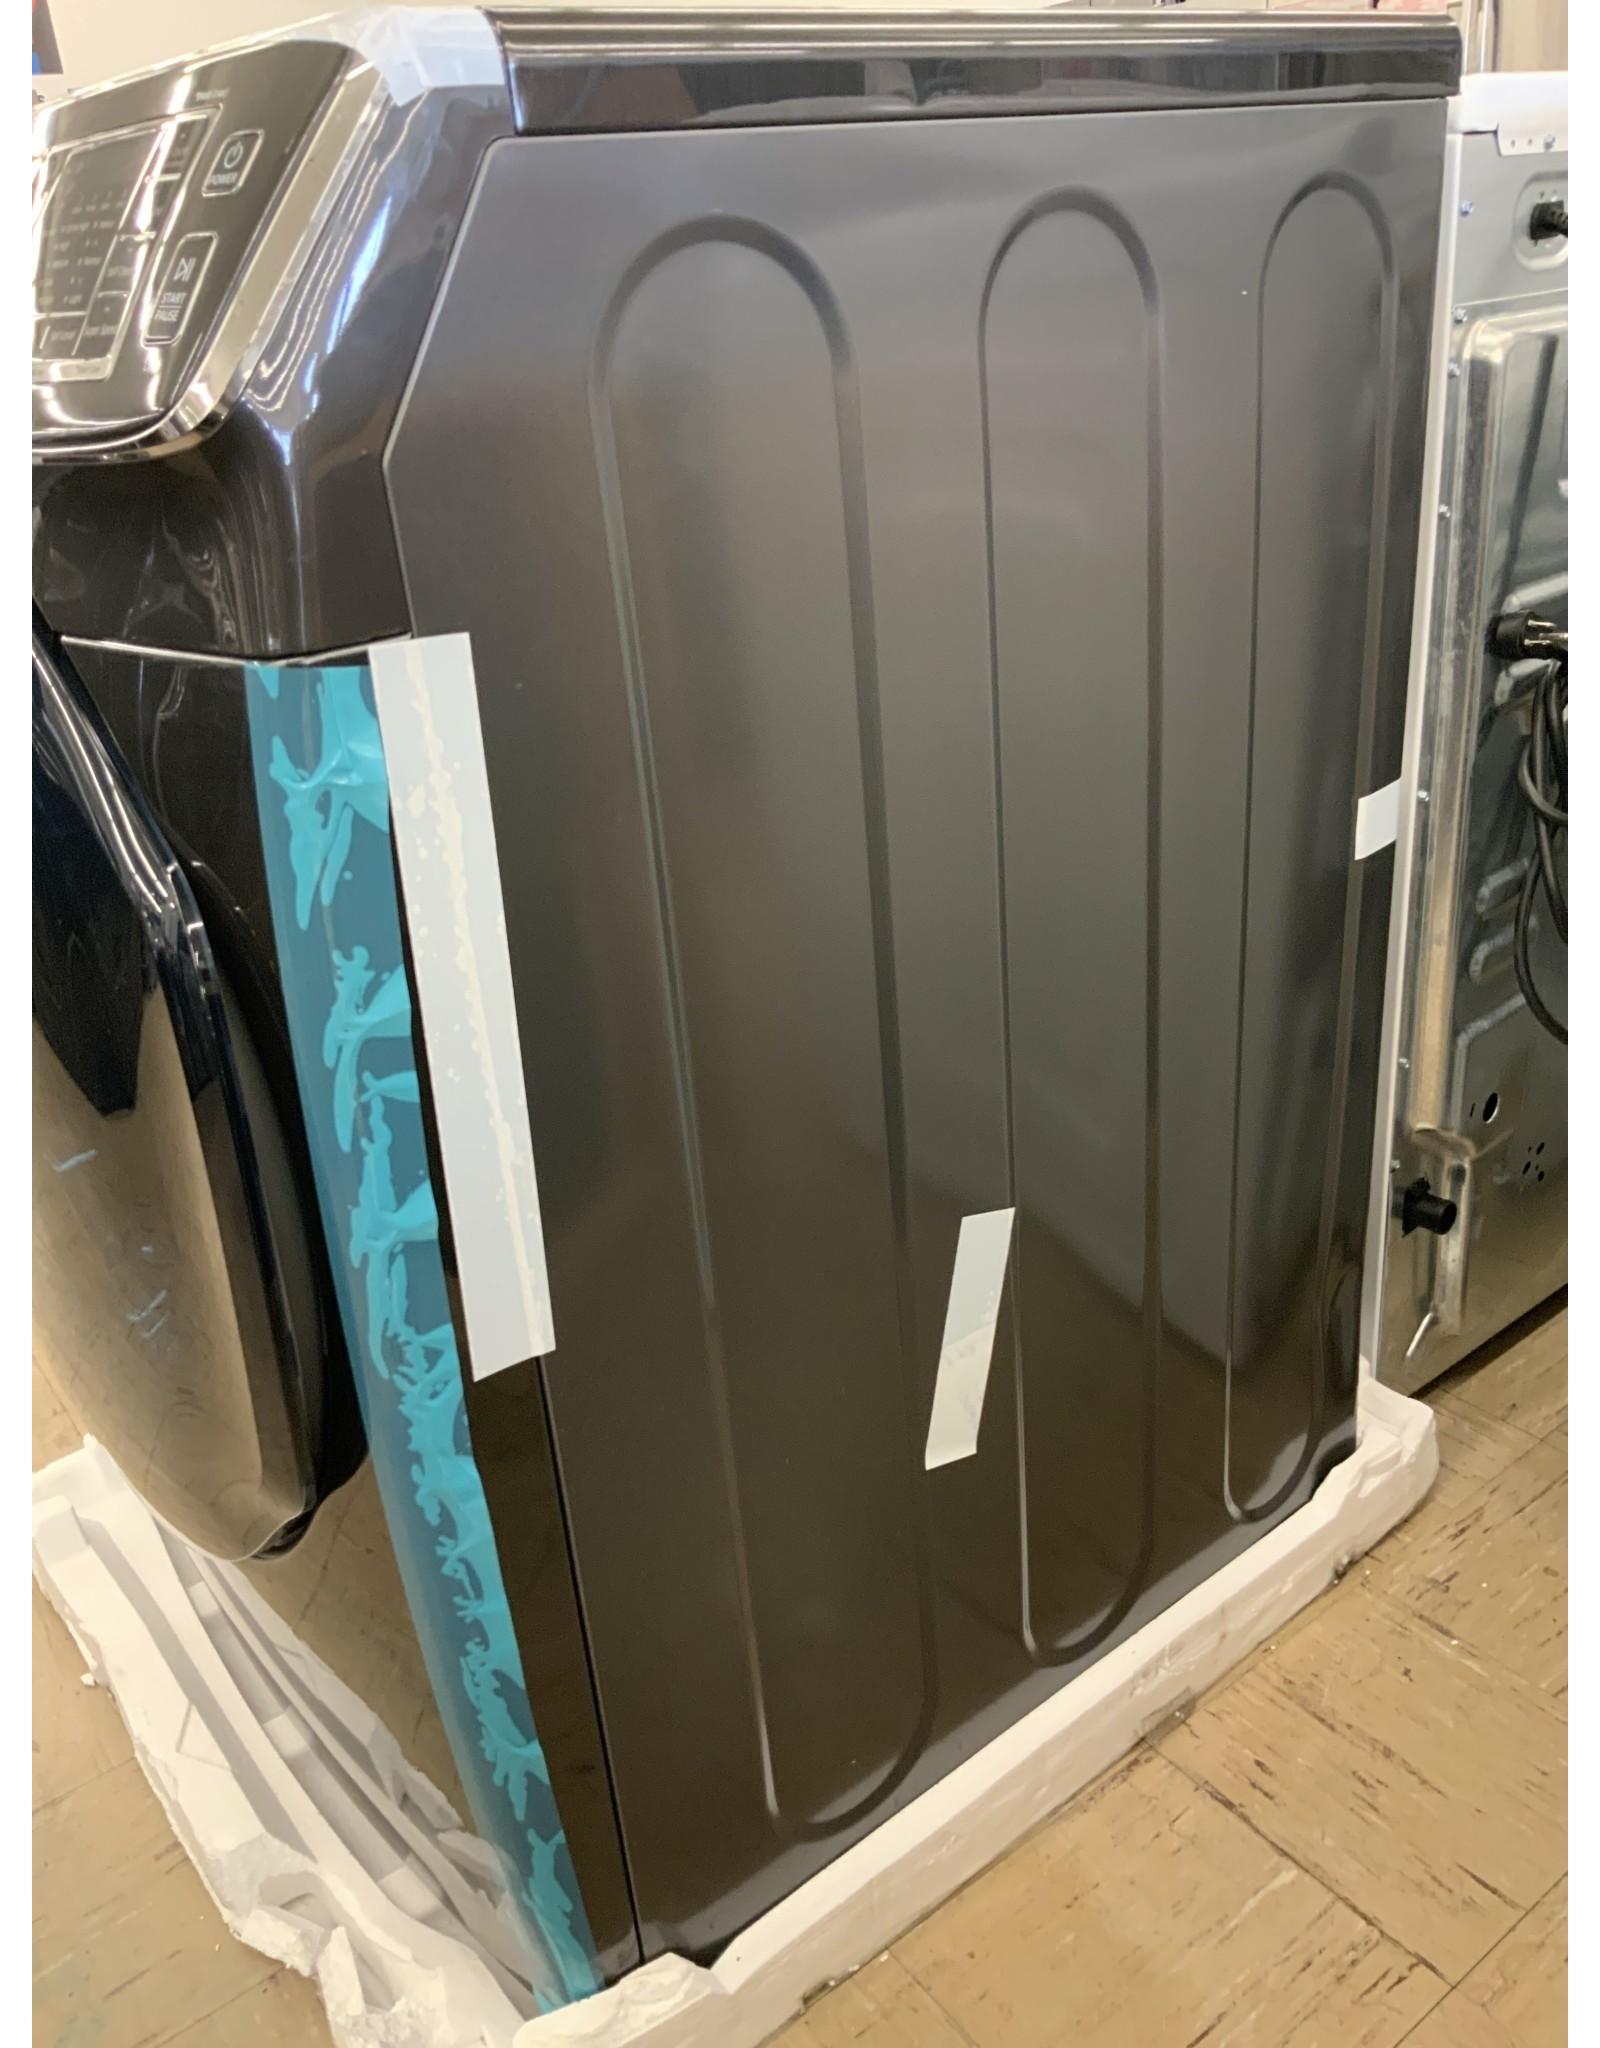 SAMSUNG WF45K6500AV Samsung 4.5 Cu. Ft. Front Load Washer 6500 Series